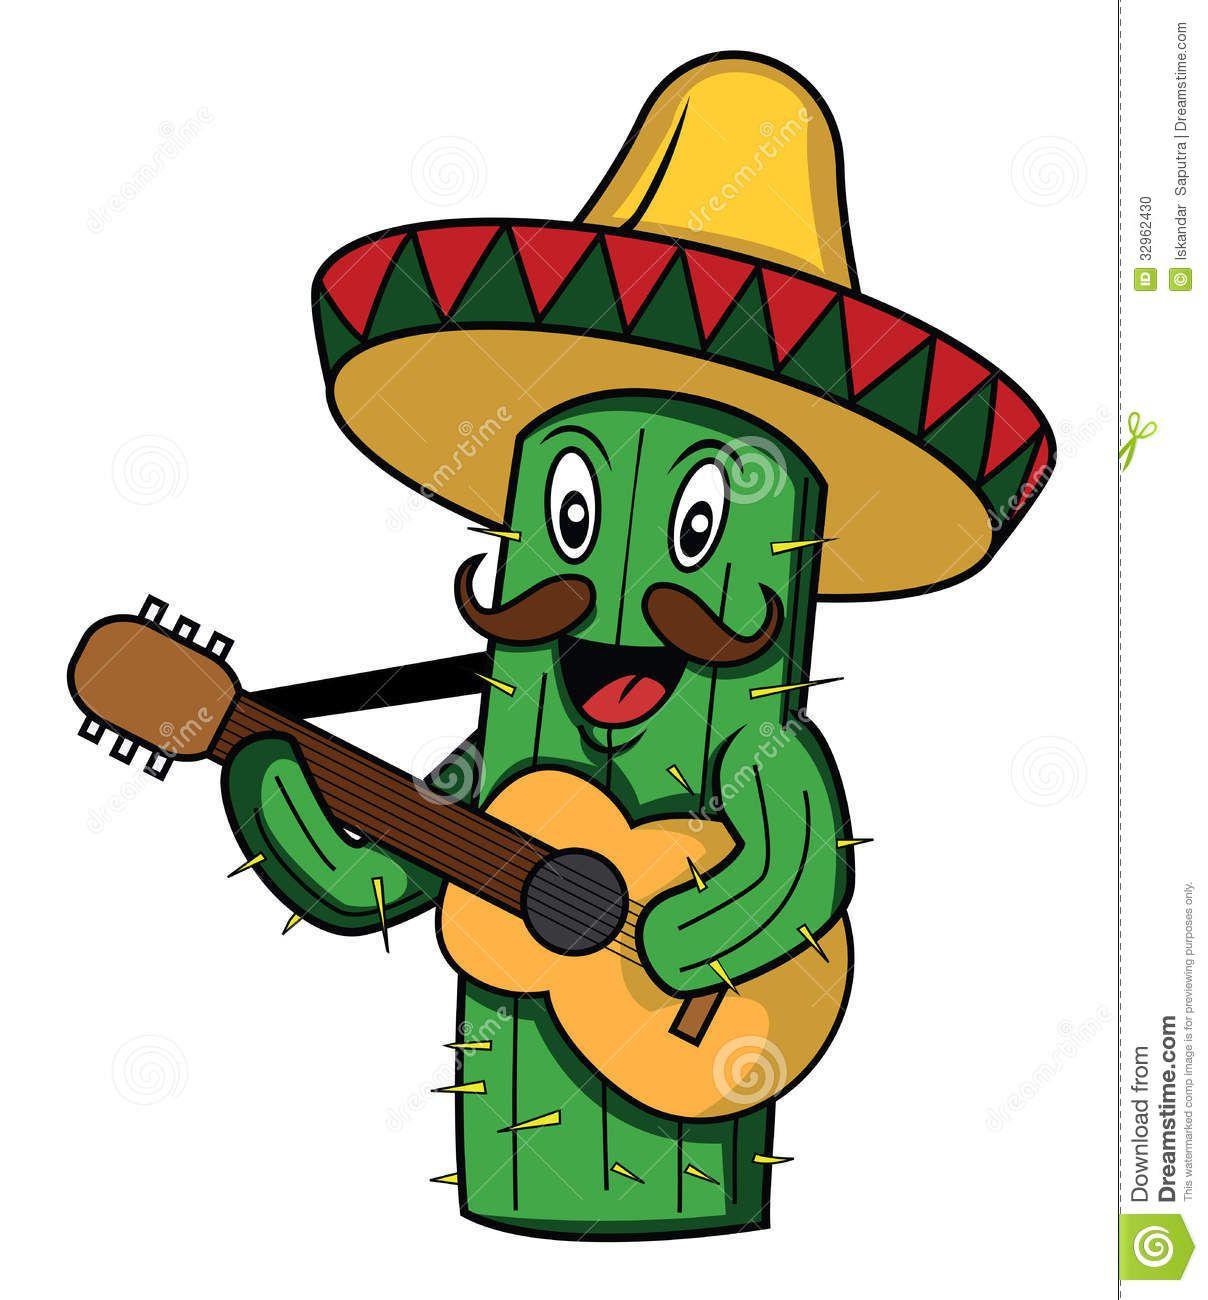 1208x1300 Cactus Clipart Mexican Guitar Vinyl Stickers Laptop Cactus Cartoon Print Vinyl Stickers